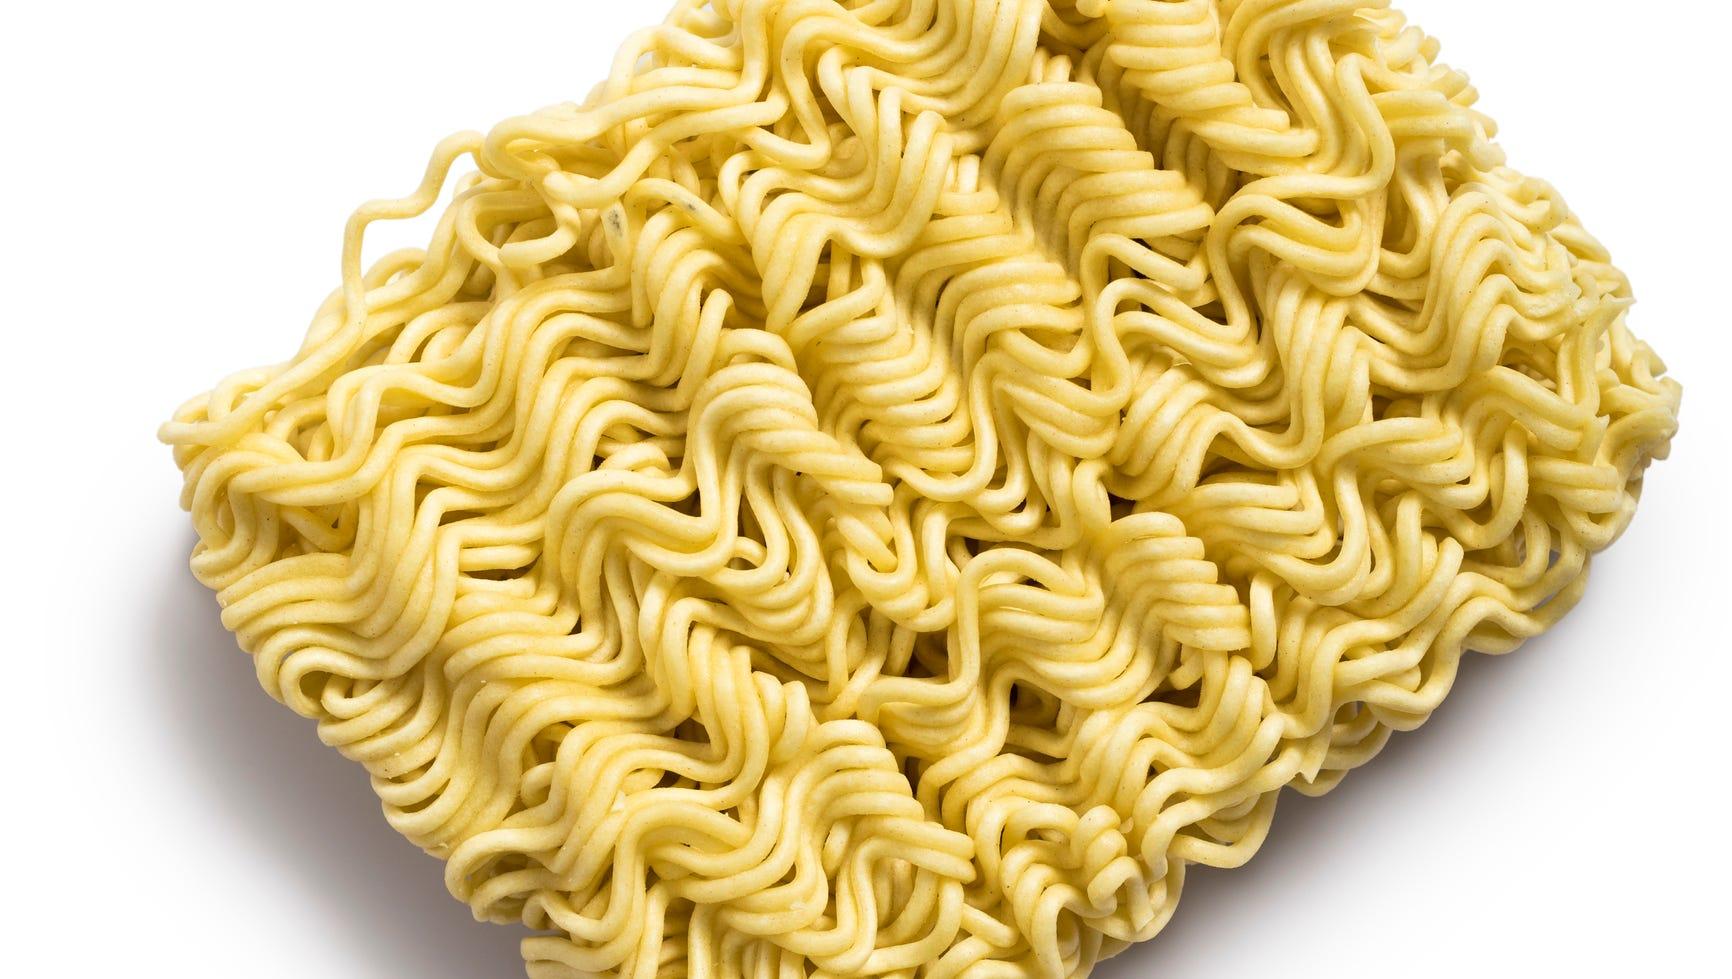 Week 21: Comfort foods and boxes of ramen, noodles